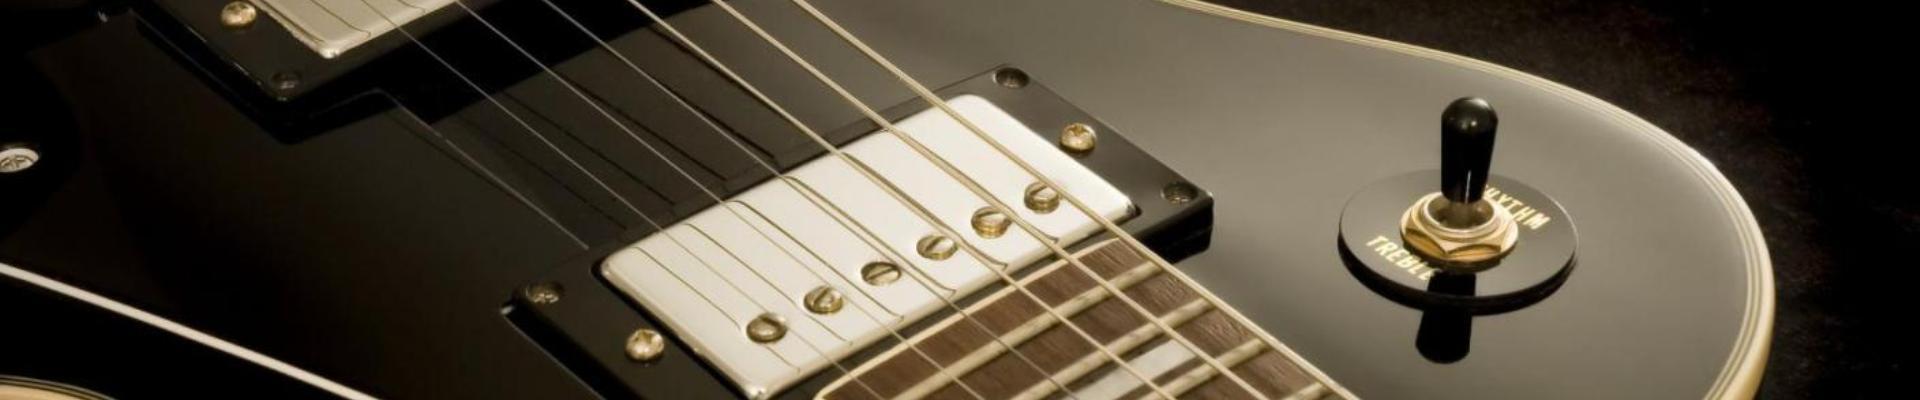 guitar-wallpaper-900x1600